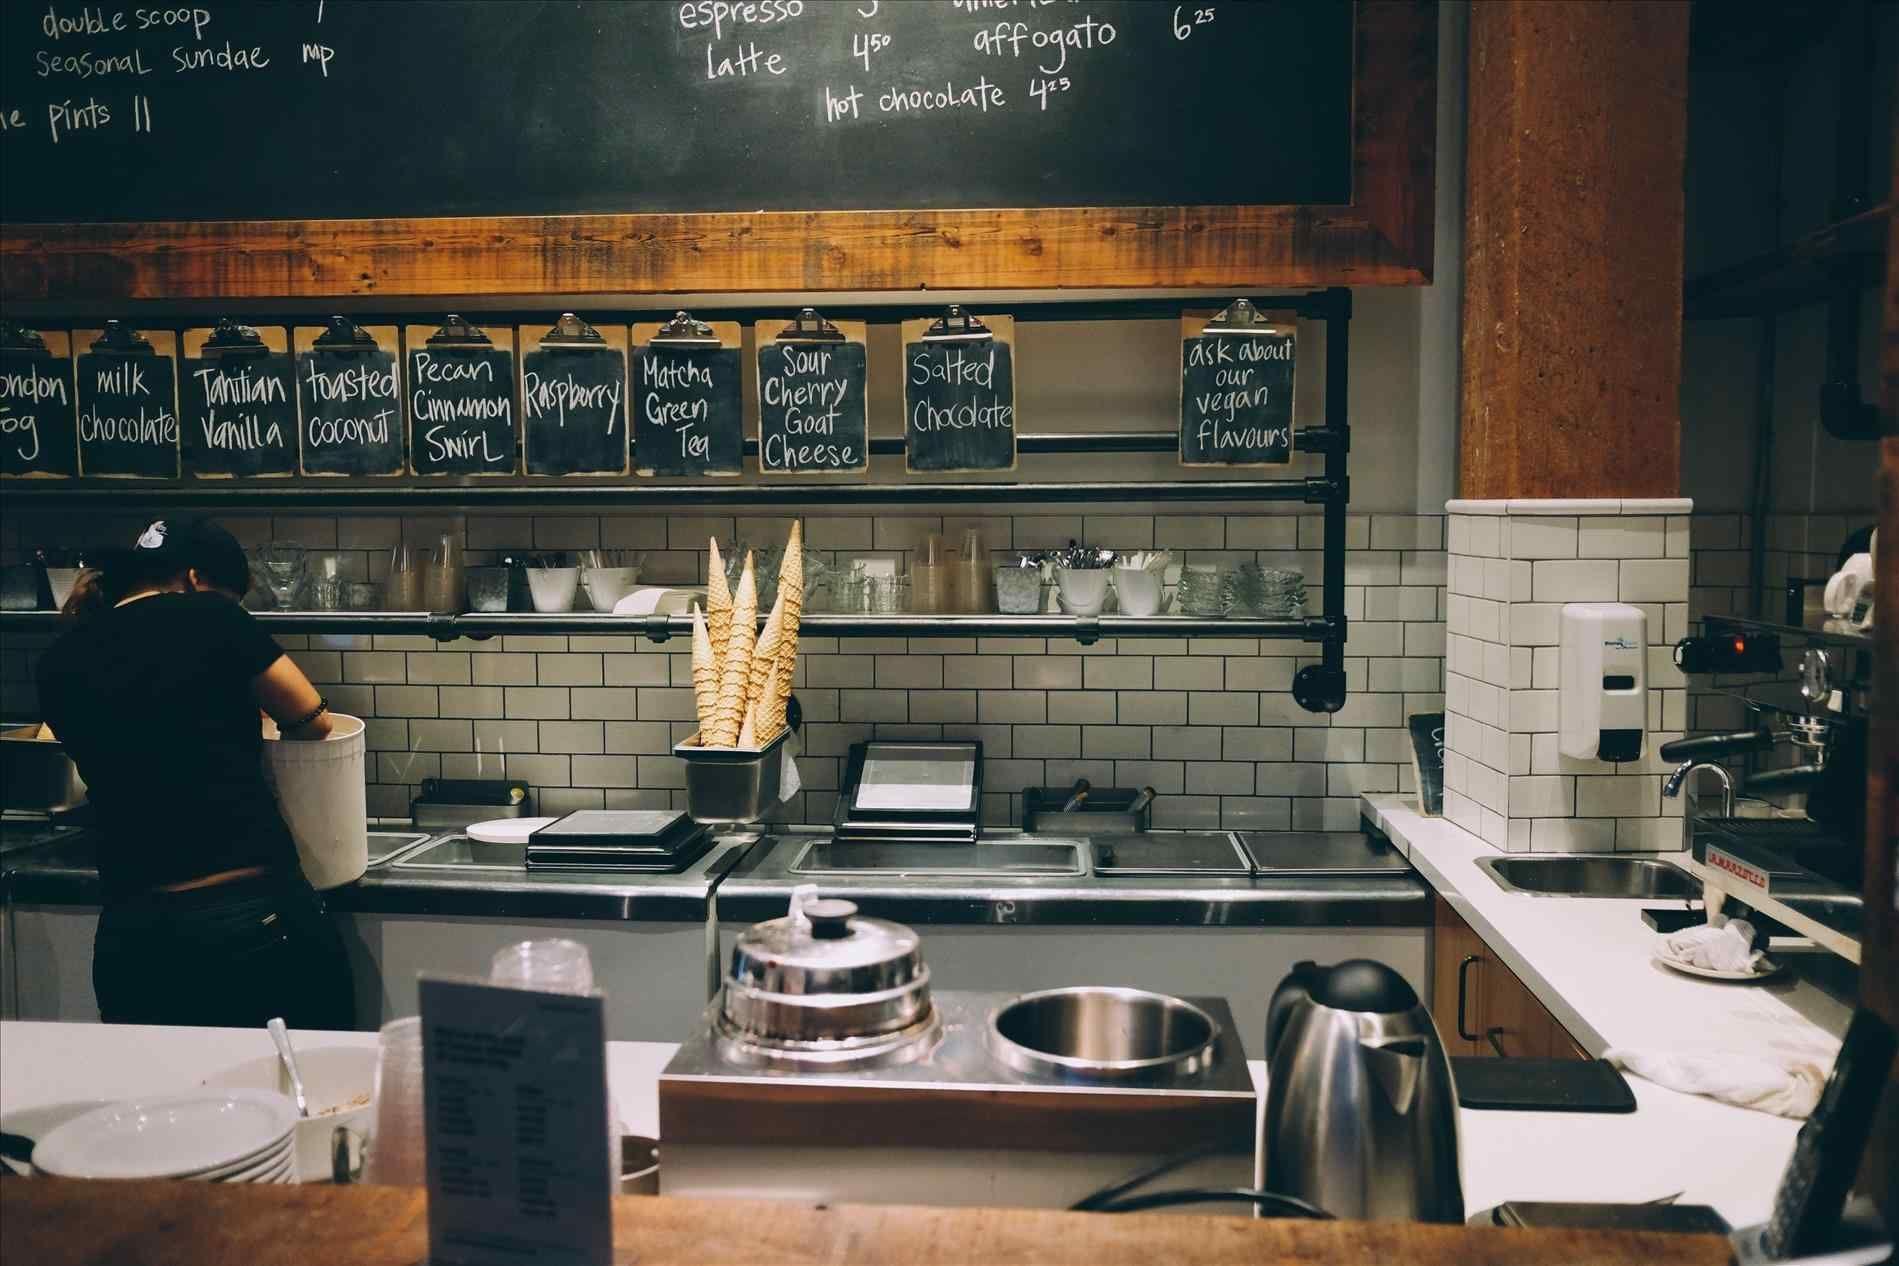 Image Result For Coffee Shop Kitchen Design Interior De Cocina Diseño De Cocina Diseño De La Cocina